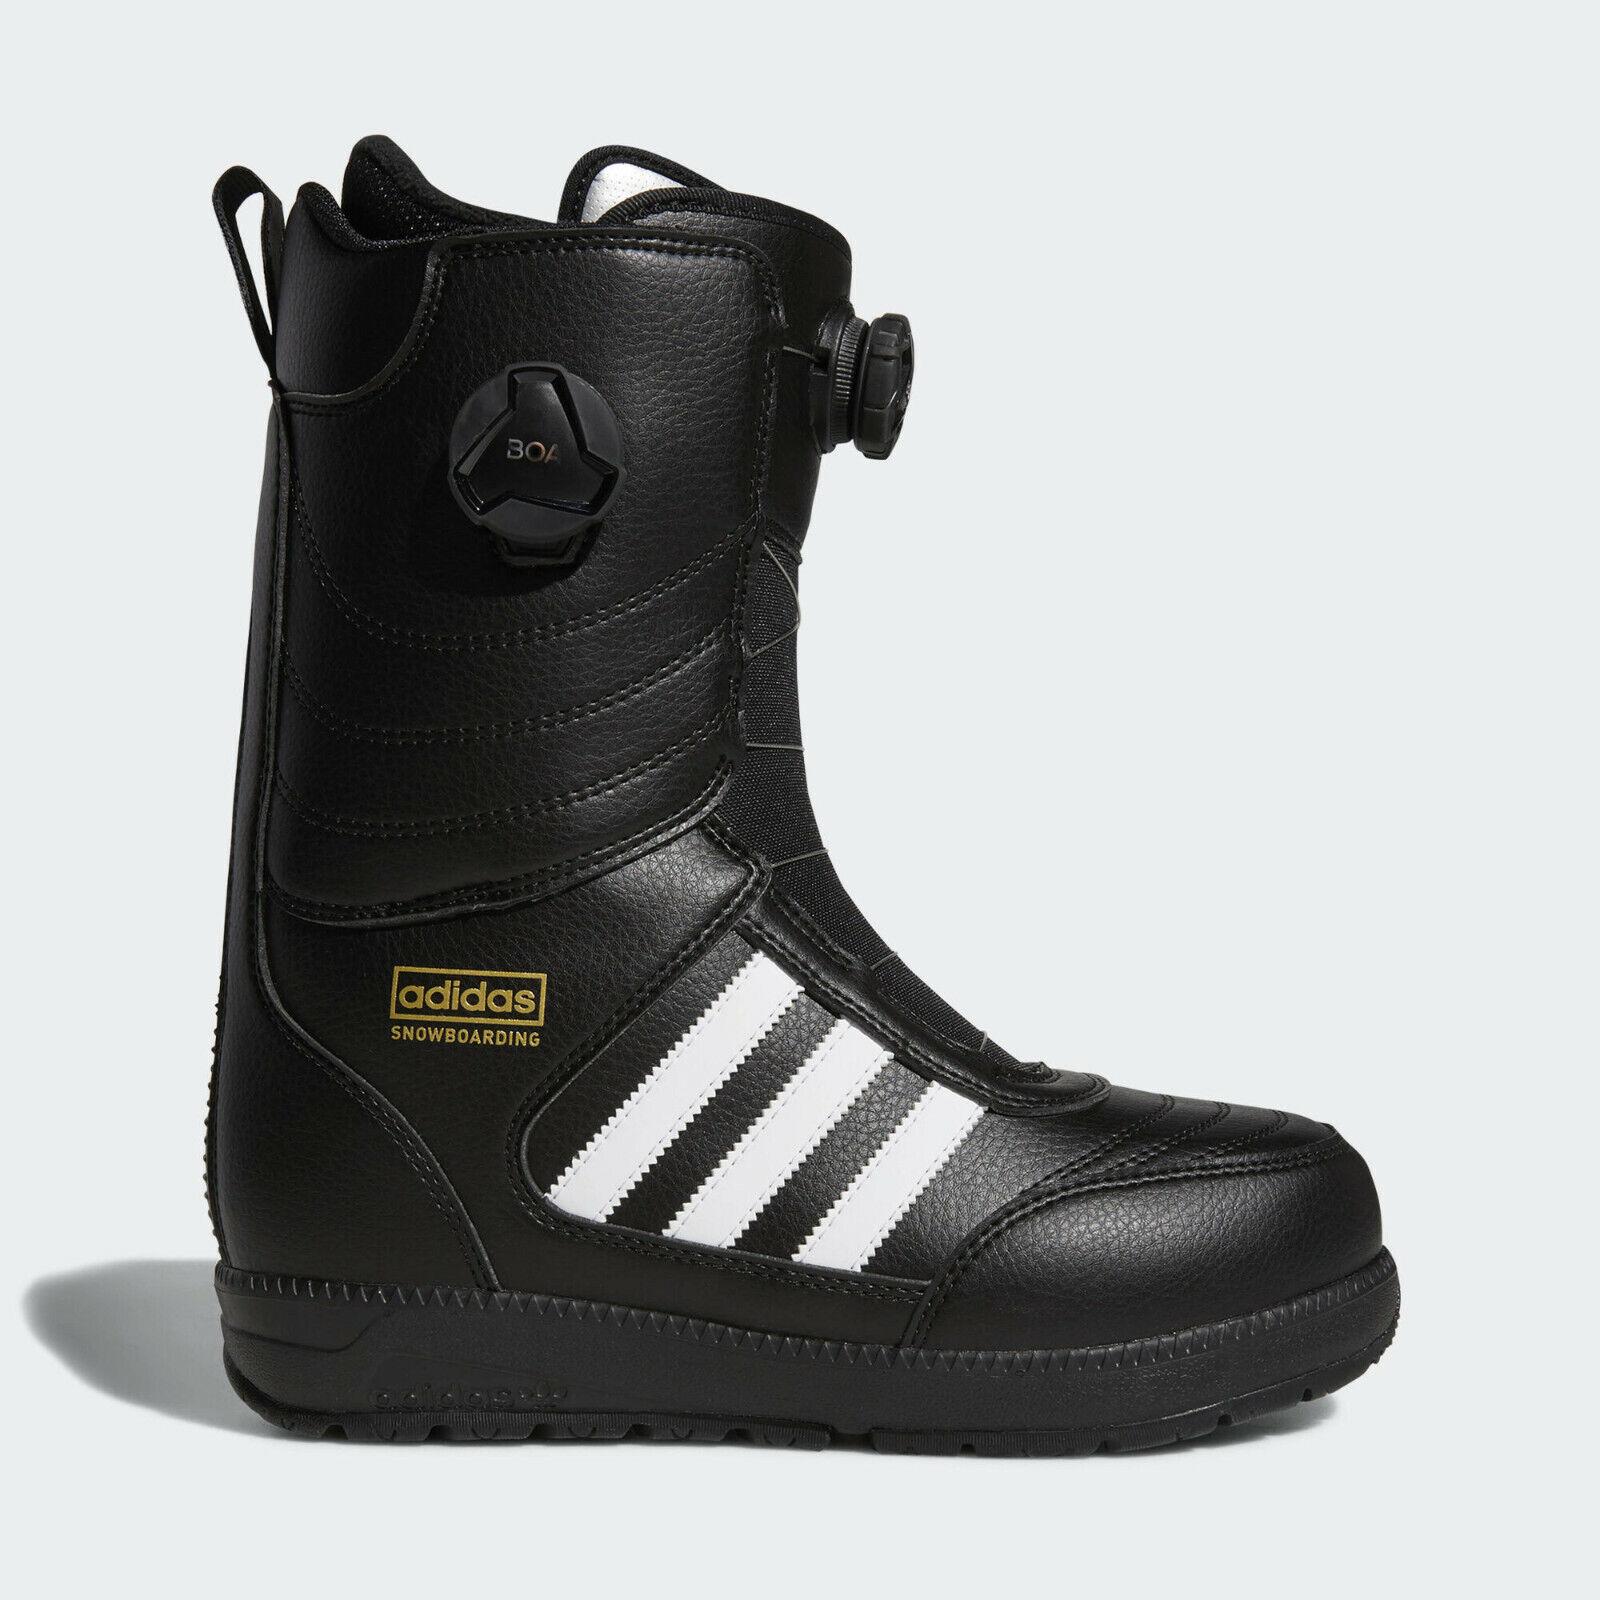 adidas Response ADV BOA Snowboarding Boots Size 11.5 Black W